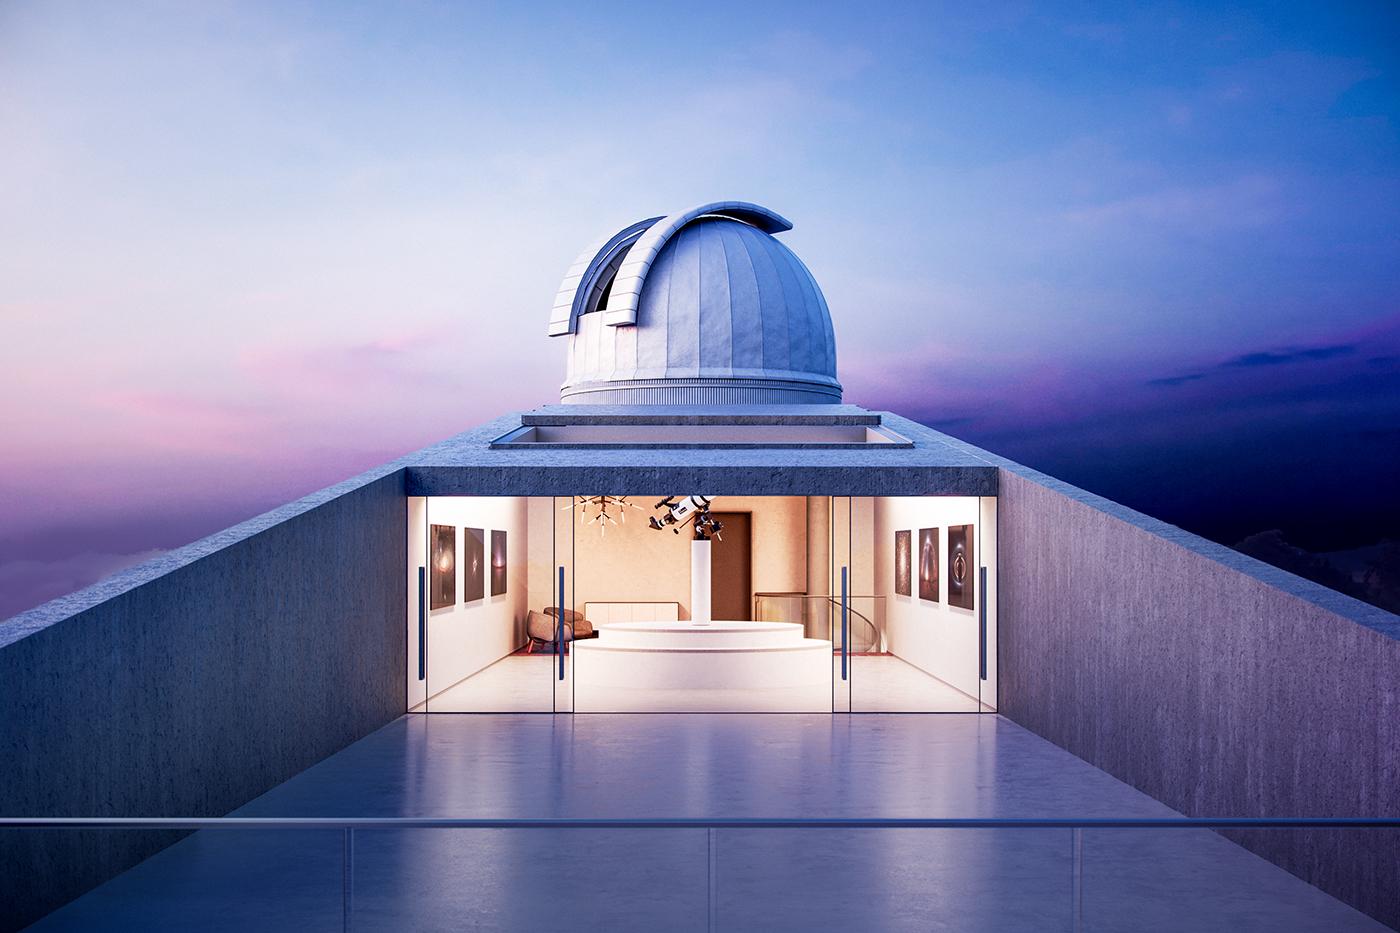 Nudes Proposes A Flamingo Observatory Built